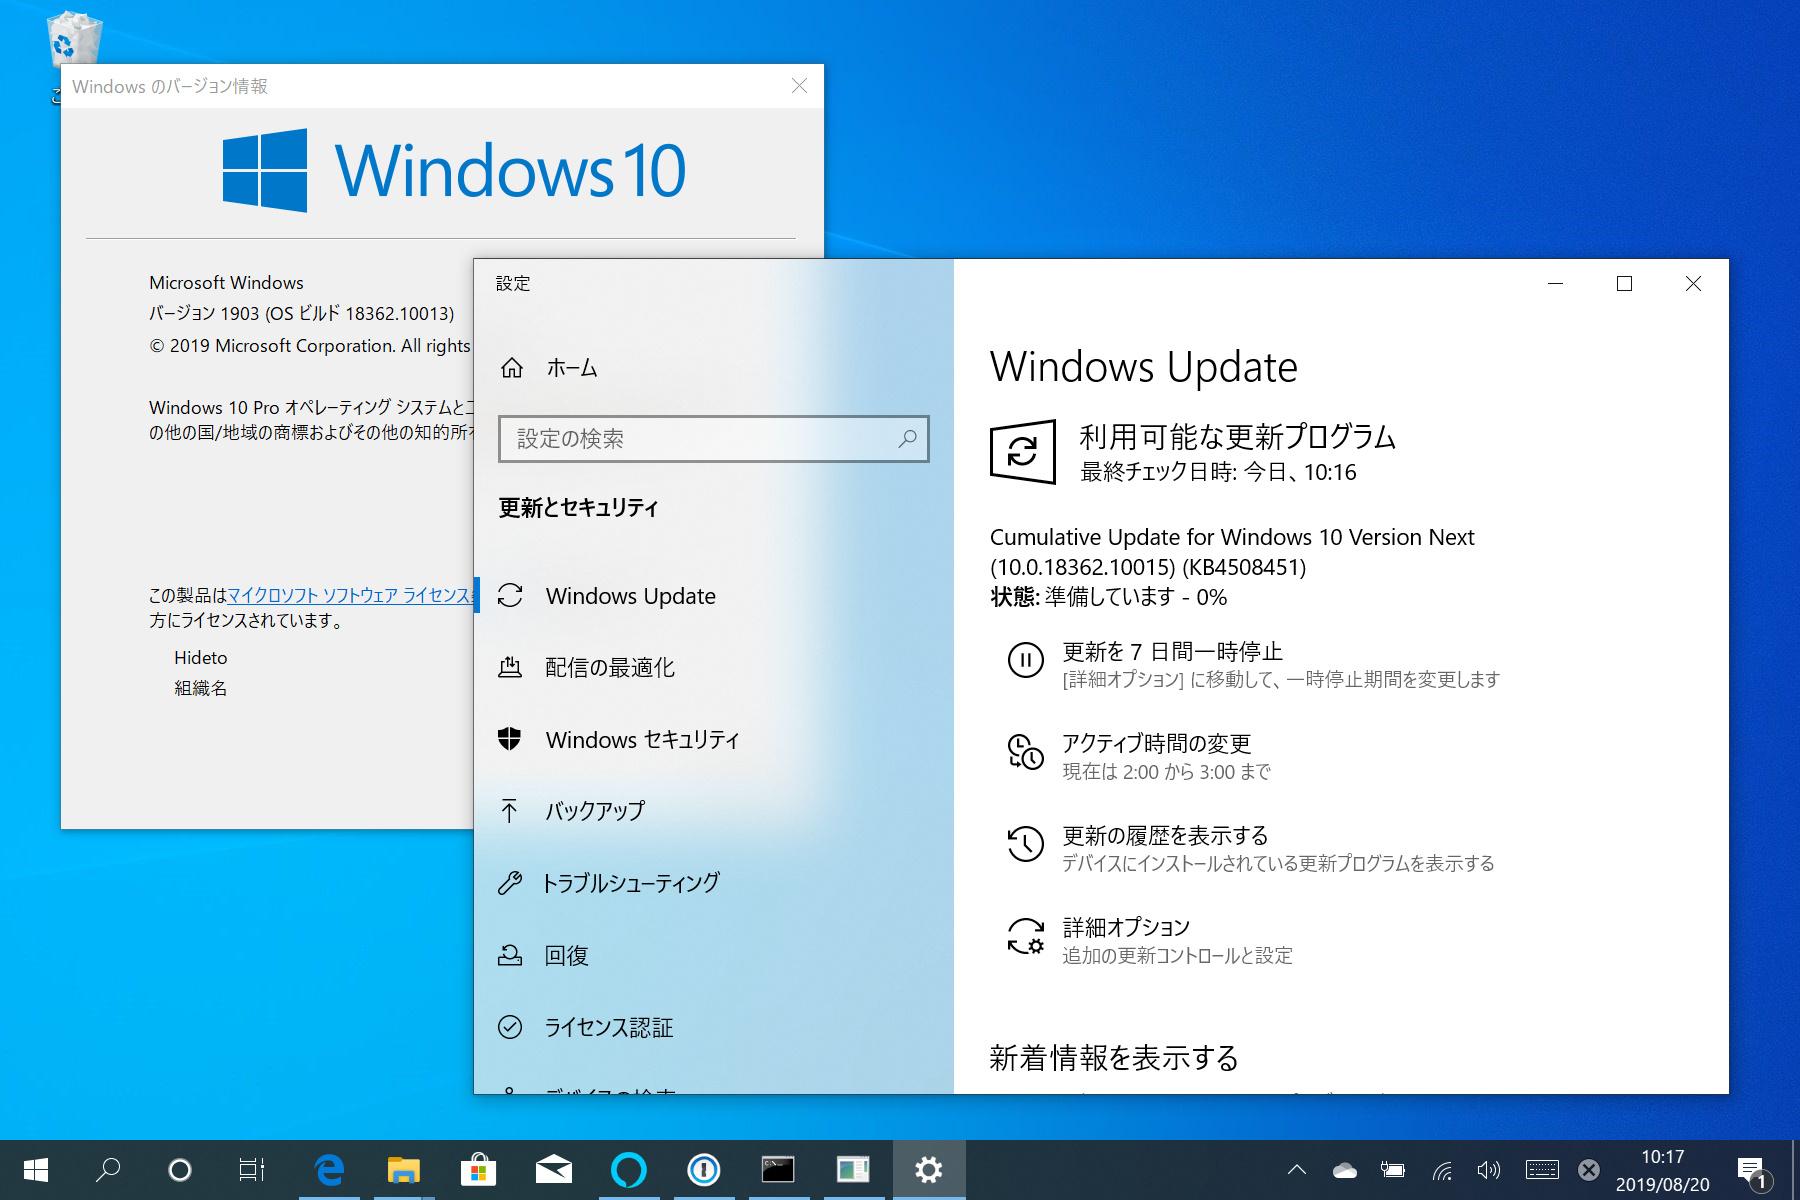 「Windows 10 19H2」Build 18362.10014とBuild 18362.10015がリリース